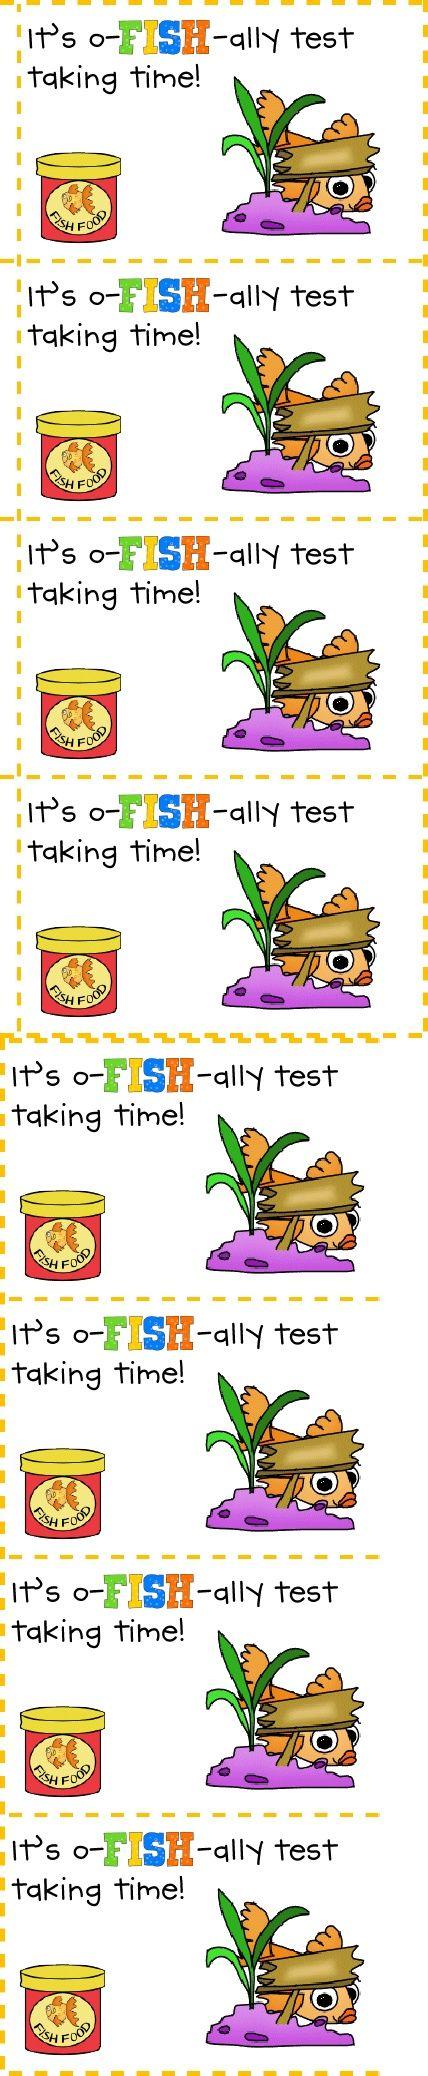 Testing Treats- copy & paste